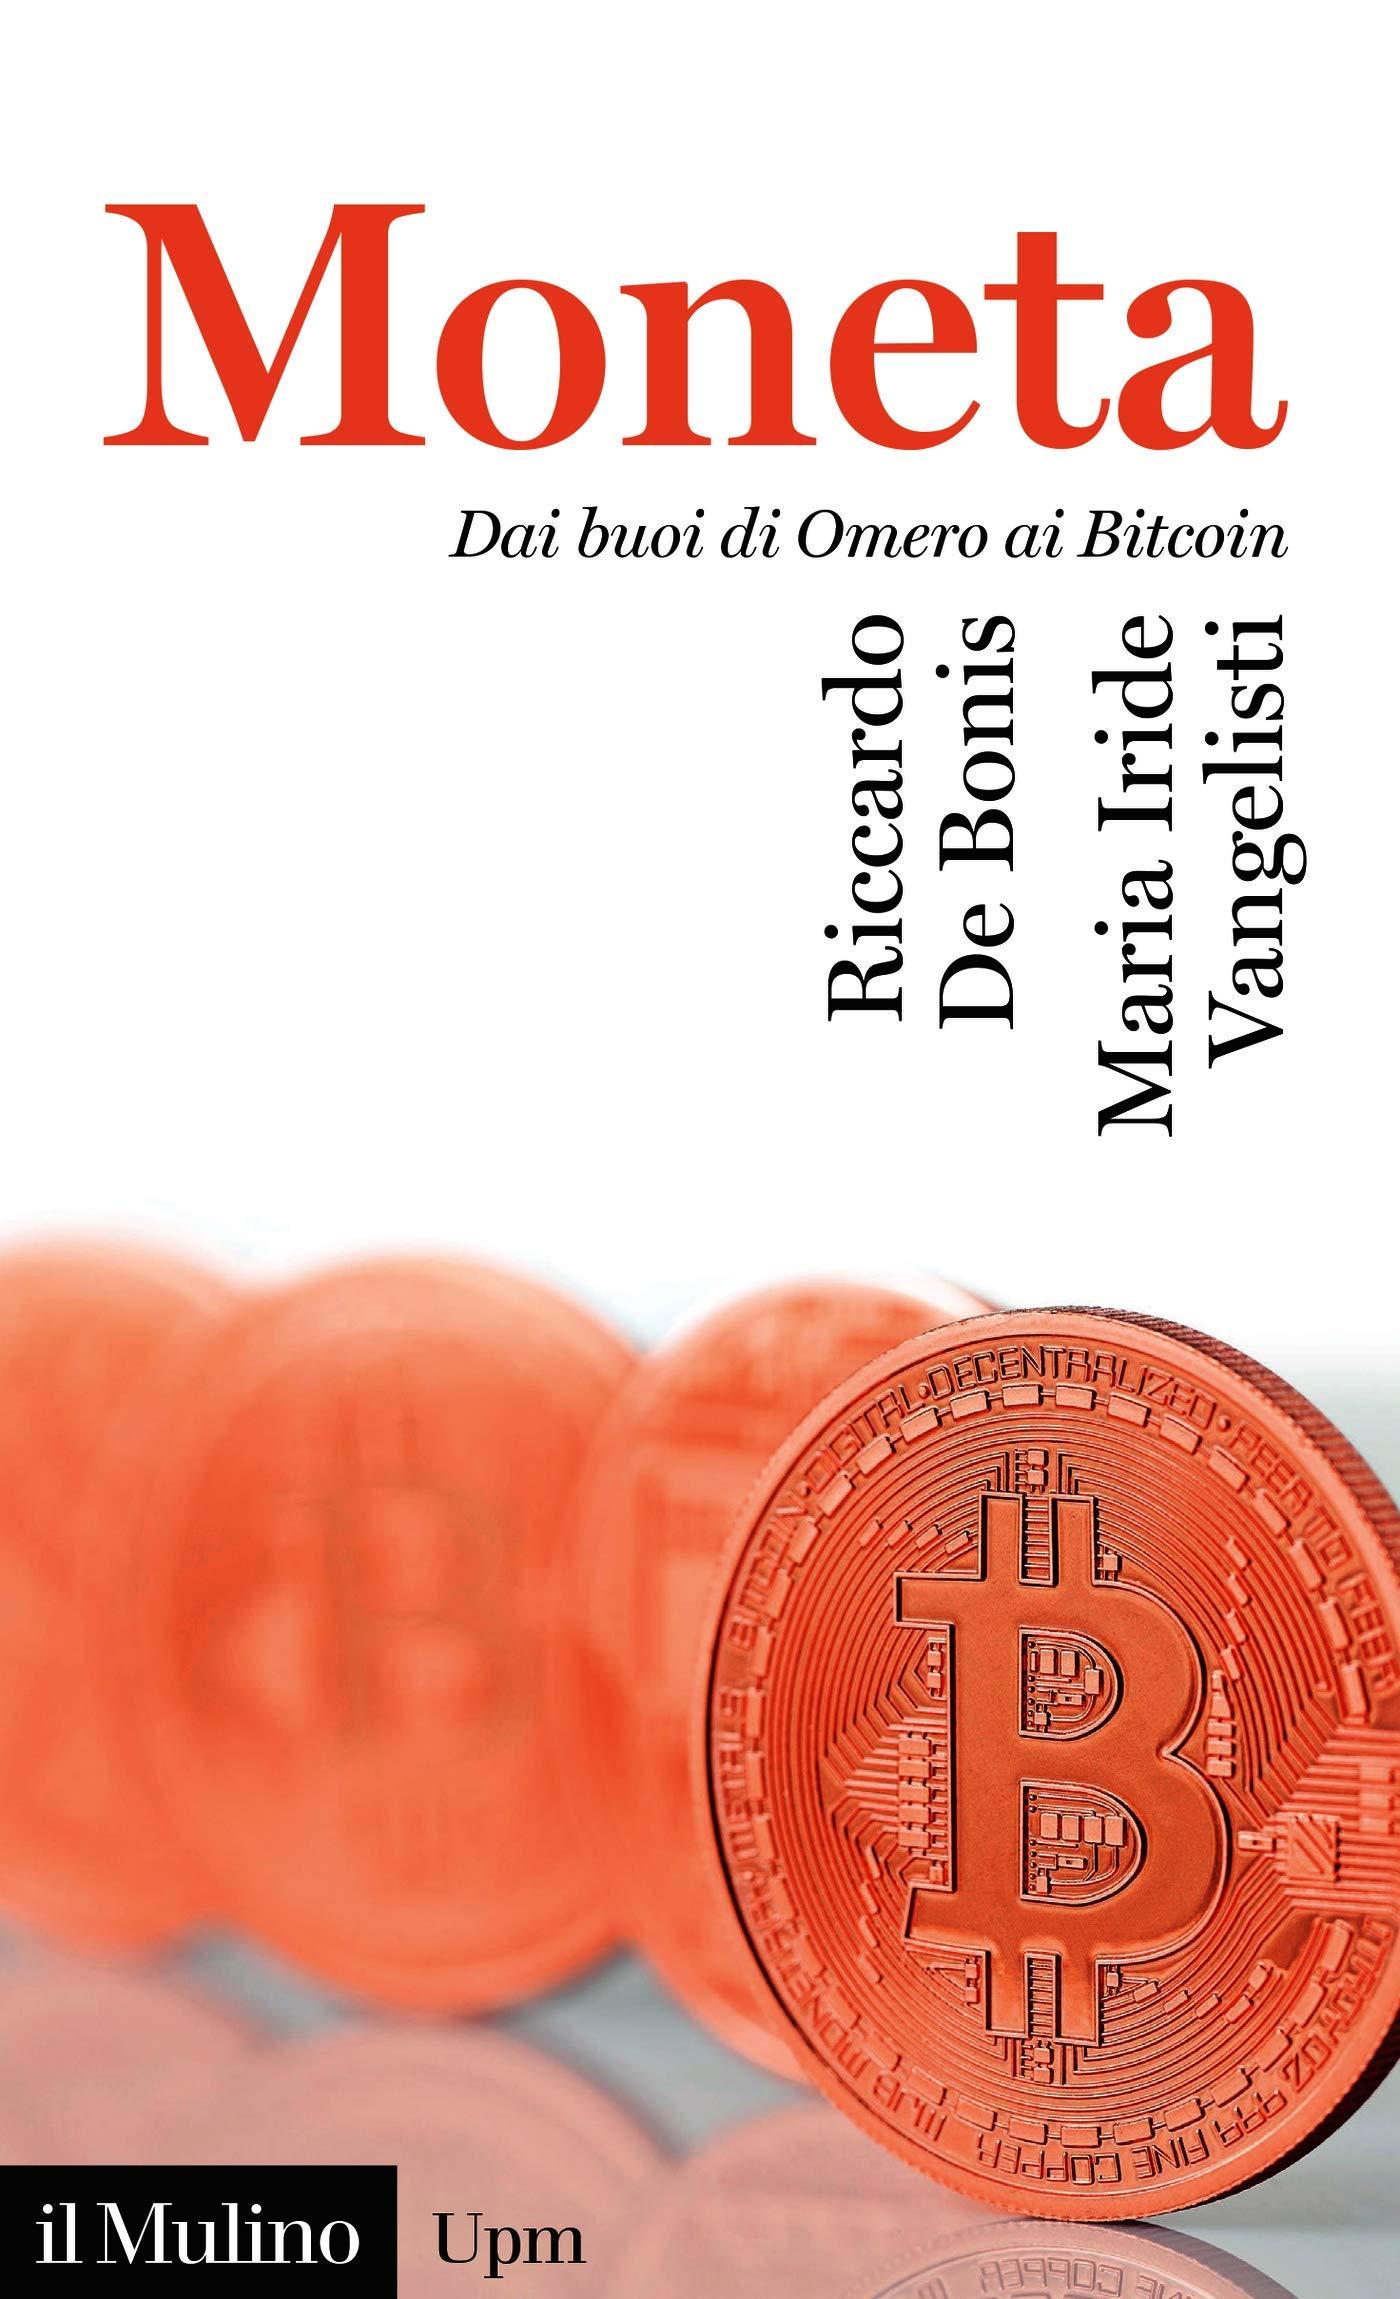 btc moneta